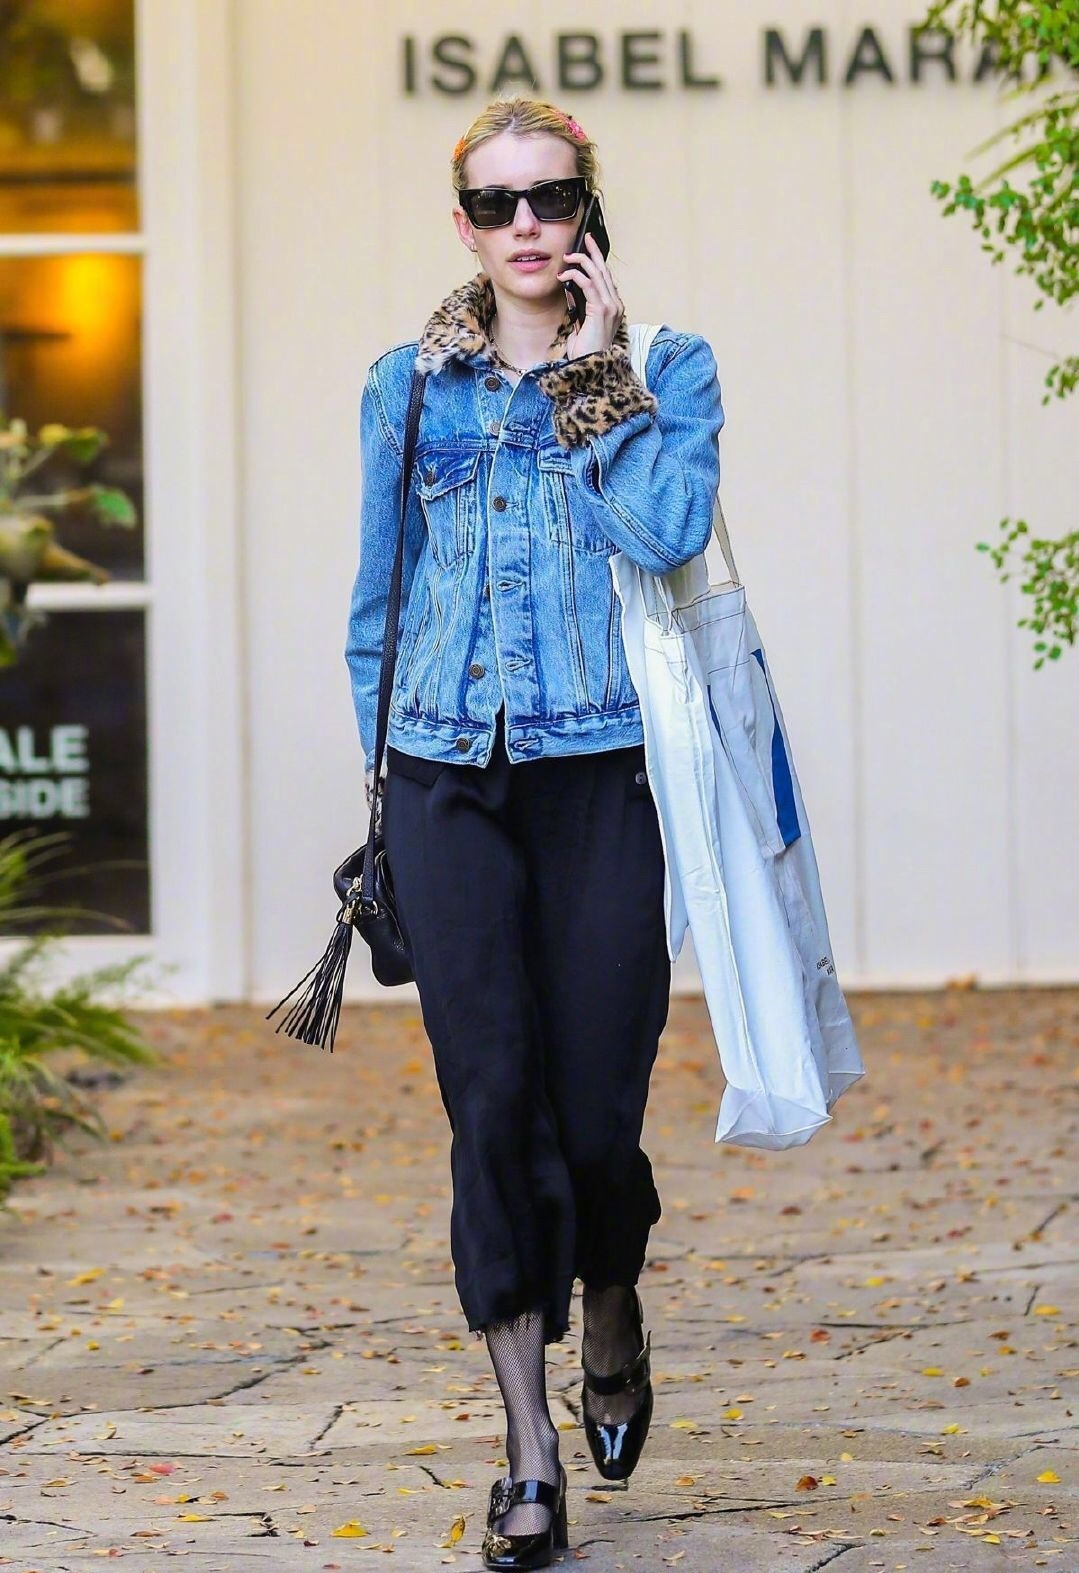 Emma Roberts街拍合集 - 身高不到160cm的她堪称小个子穿衣典范☁️☁